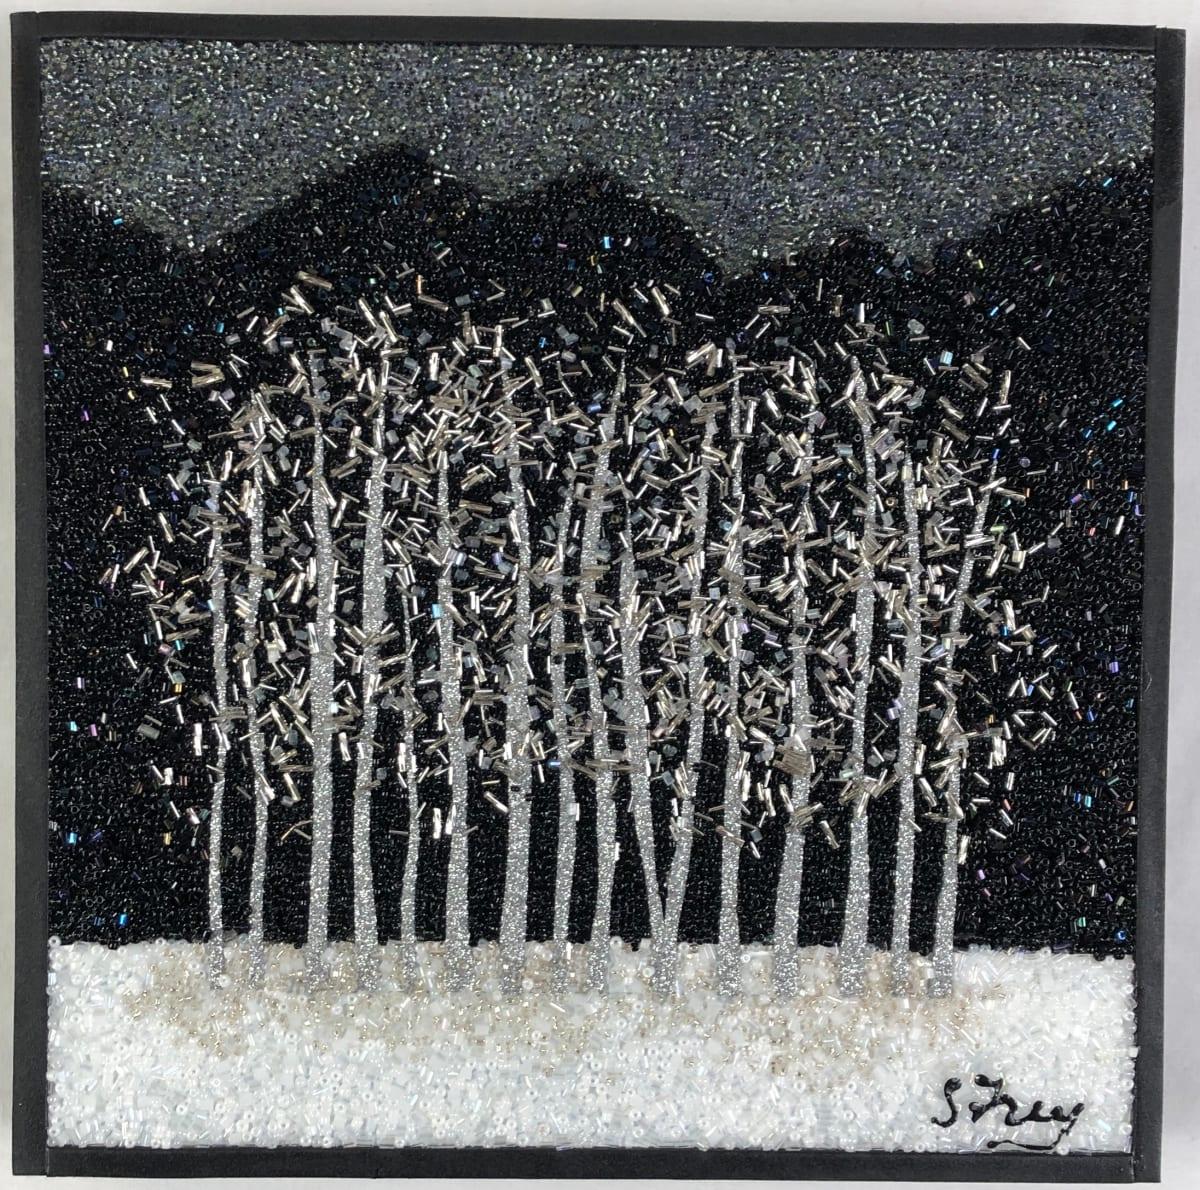 Winter Grace 5 #5 by Sabrina Frey